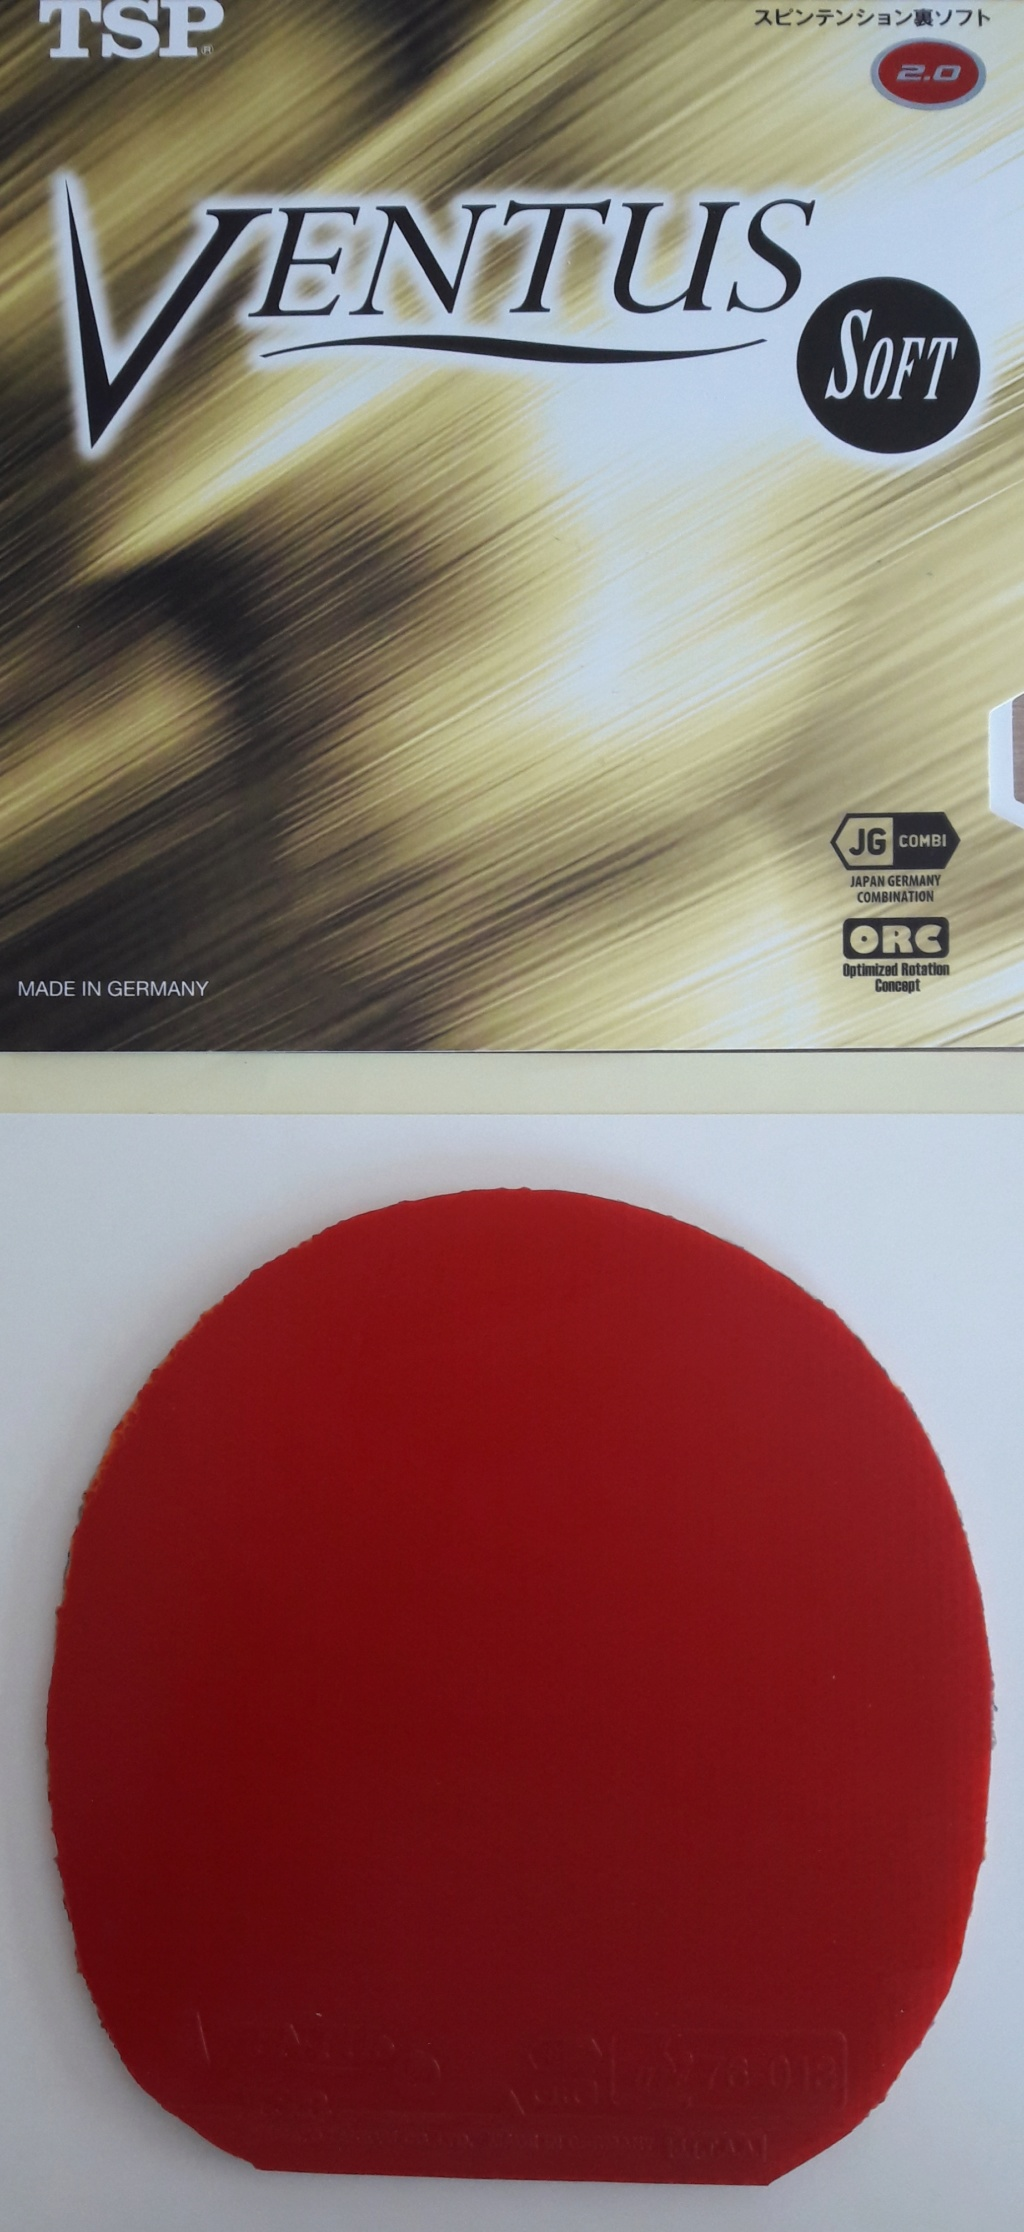 TSP Ventus soft Rouge 2mm X14.6Y15 TBE: 15 Euros fdpi Ventus11